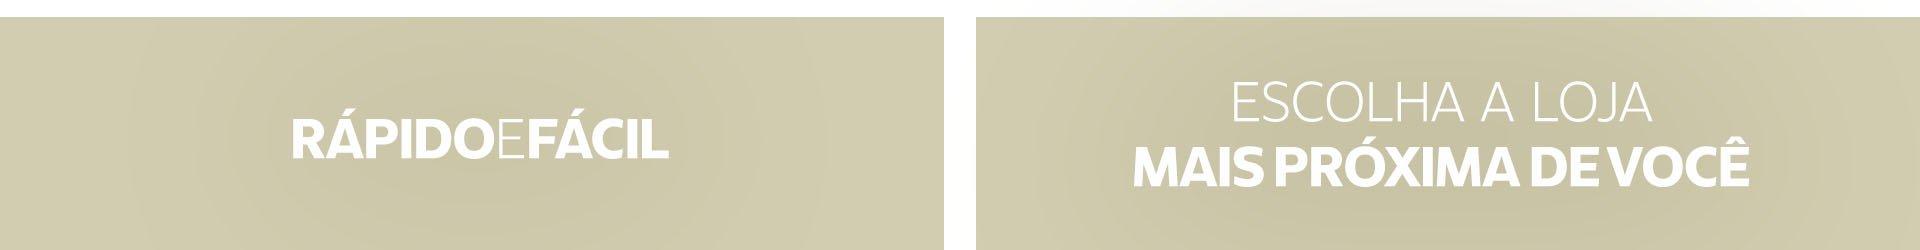 Banner-RetireEntrega-apoio-1.jpg